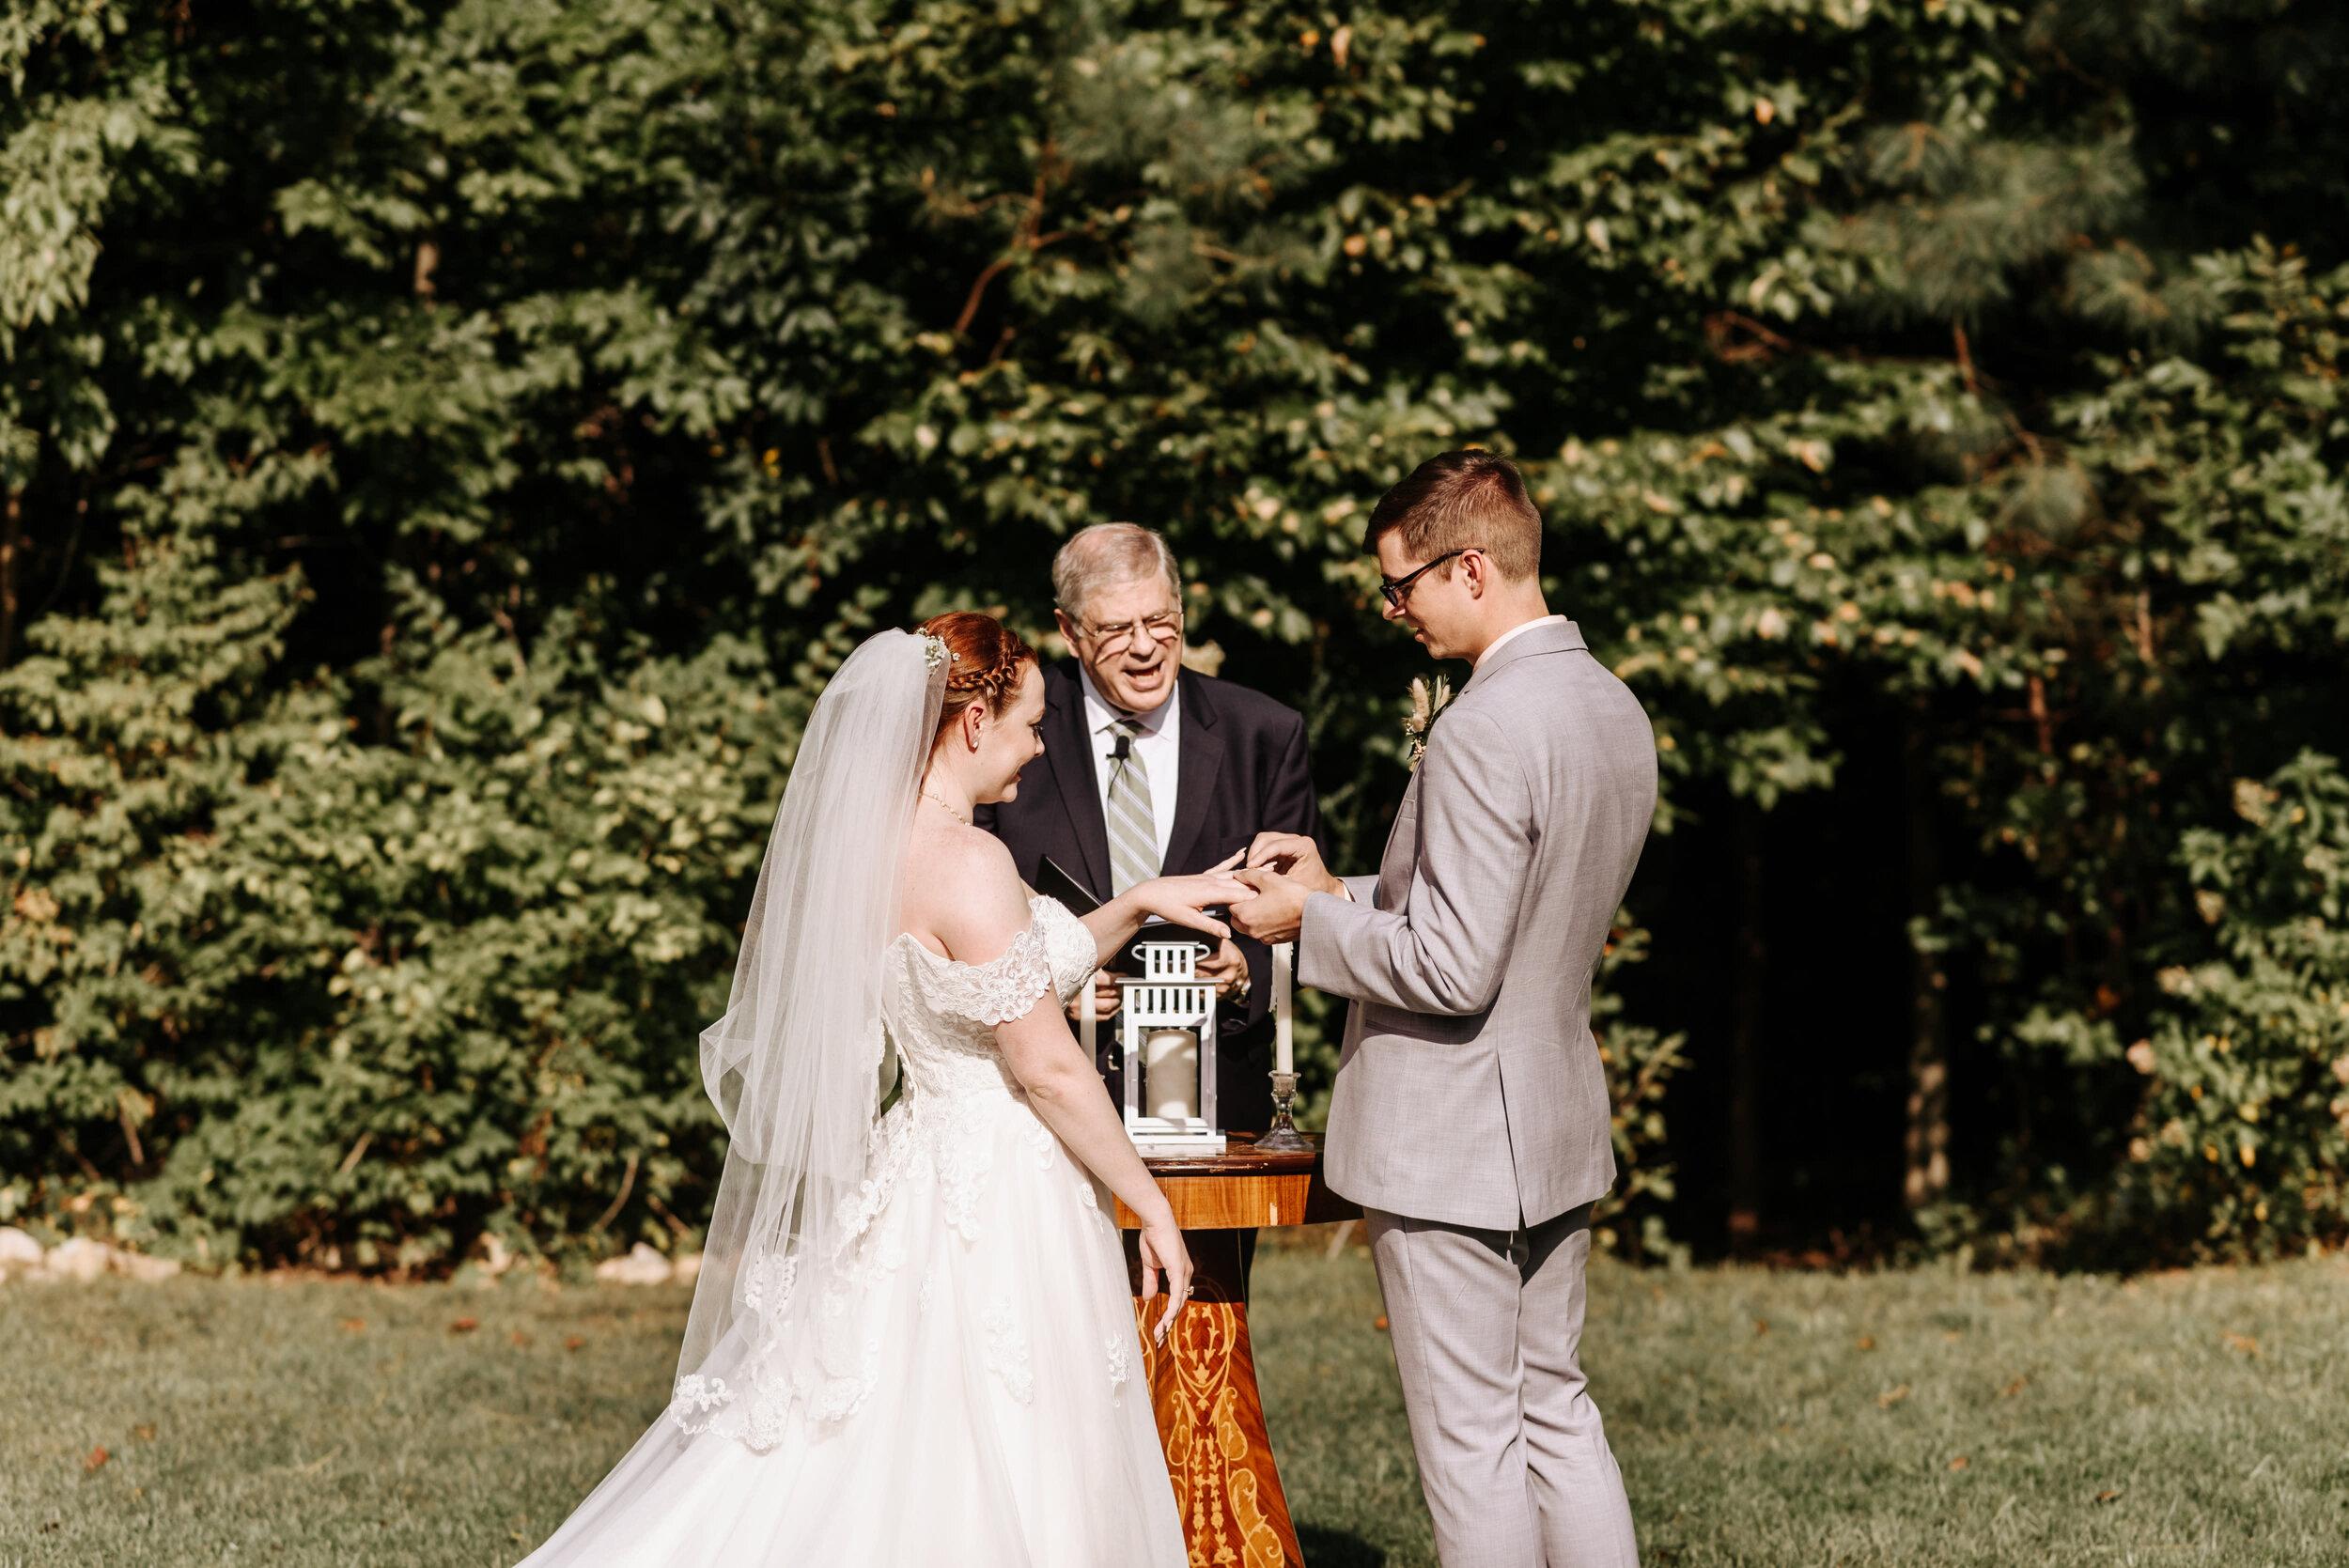 Rachel_David_Wedding_Richmond_Virginia_Photography_by_V_24.jpg